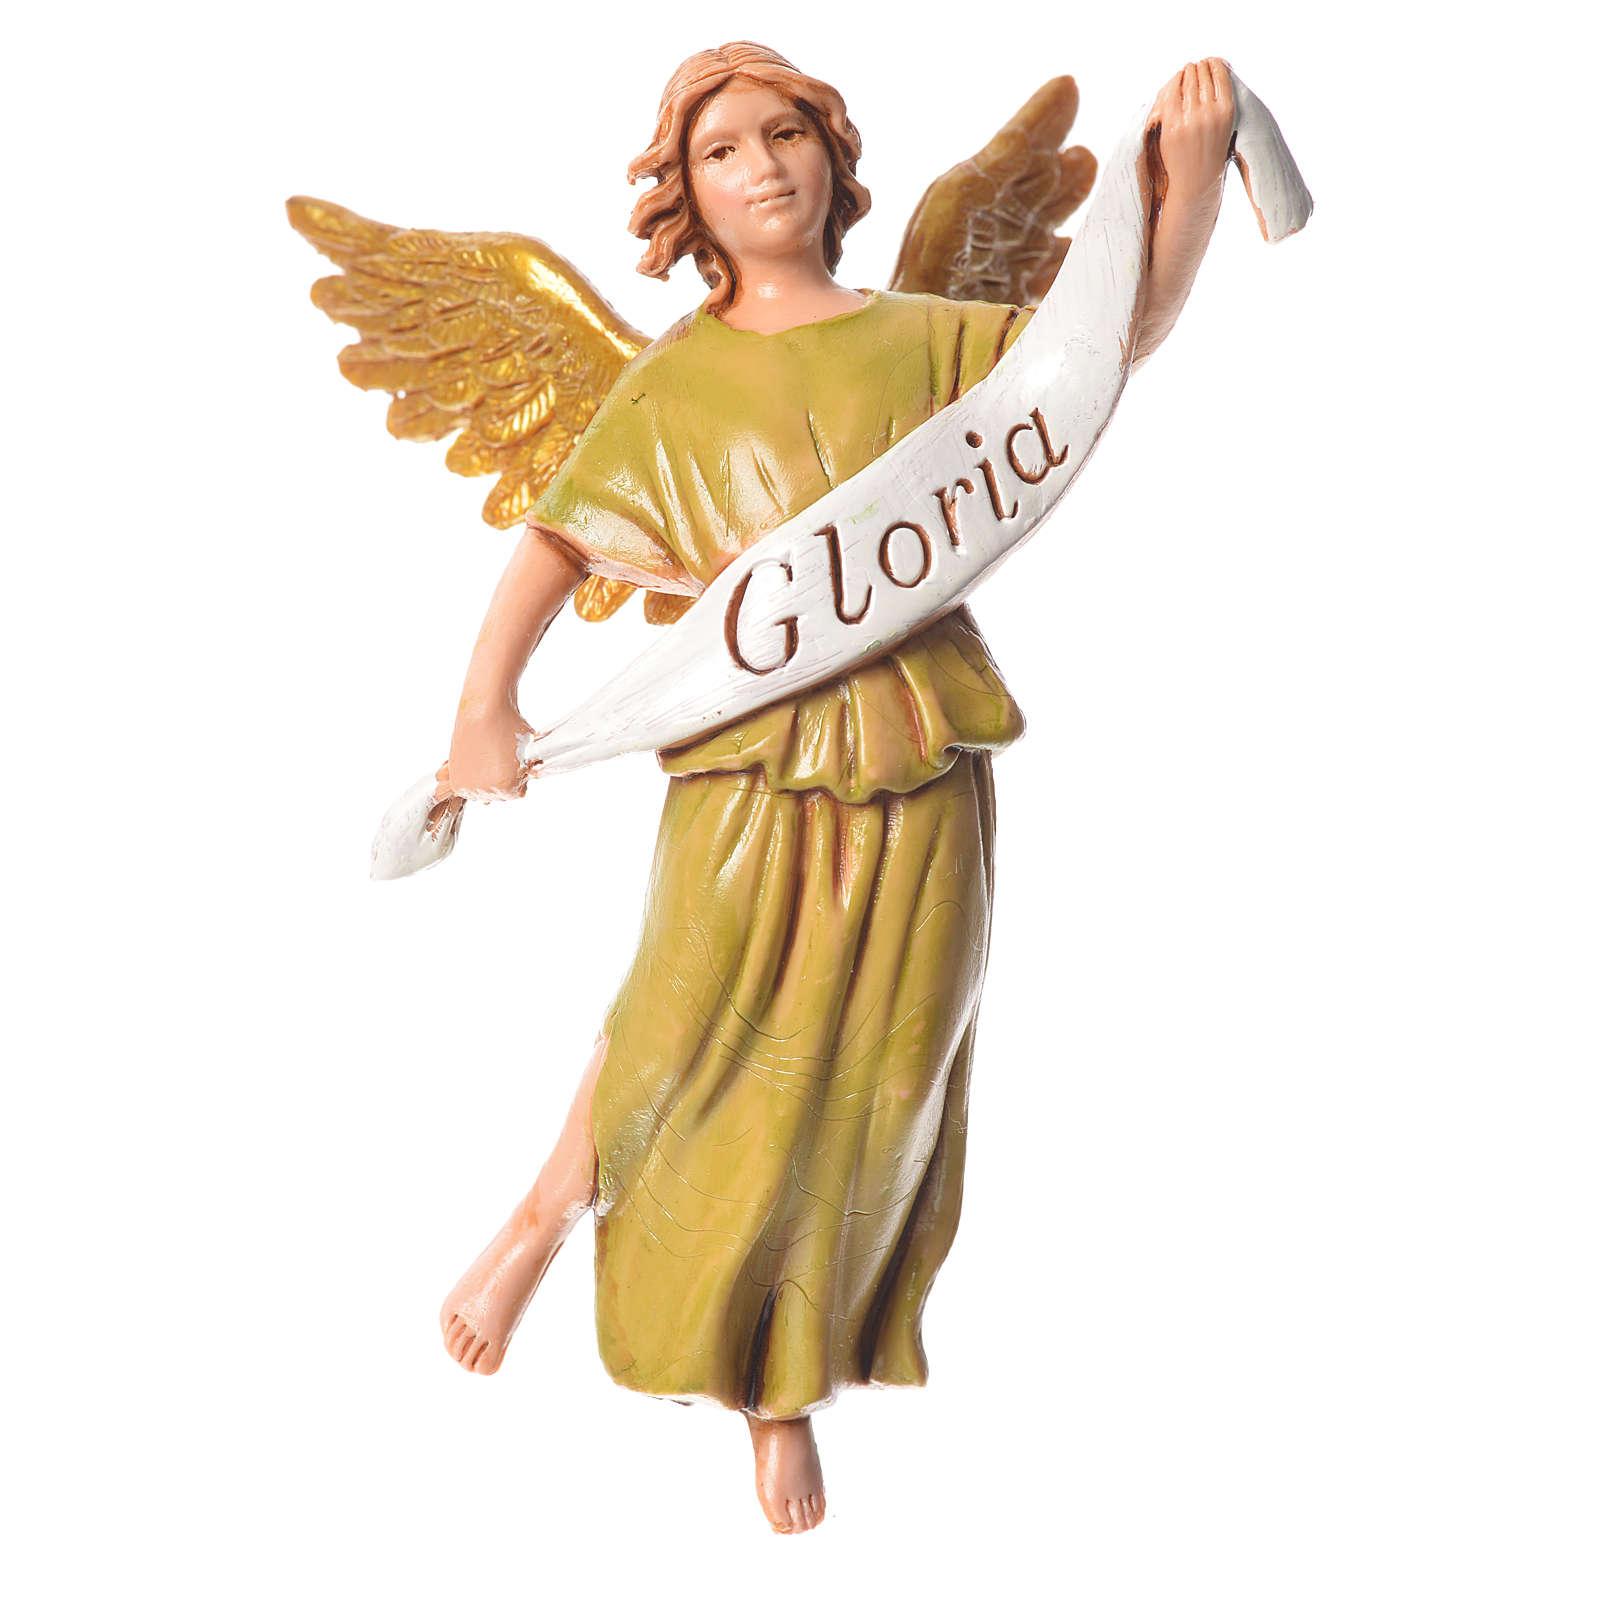 Angelo gloria oro 10 cm Moranduzzo 4